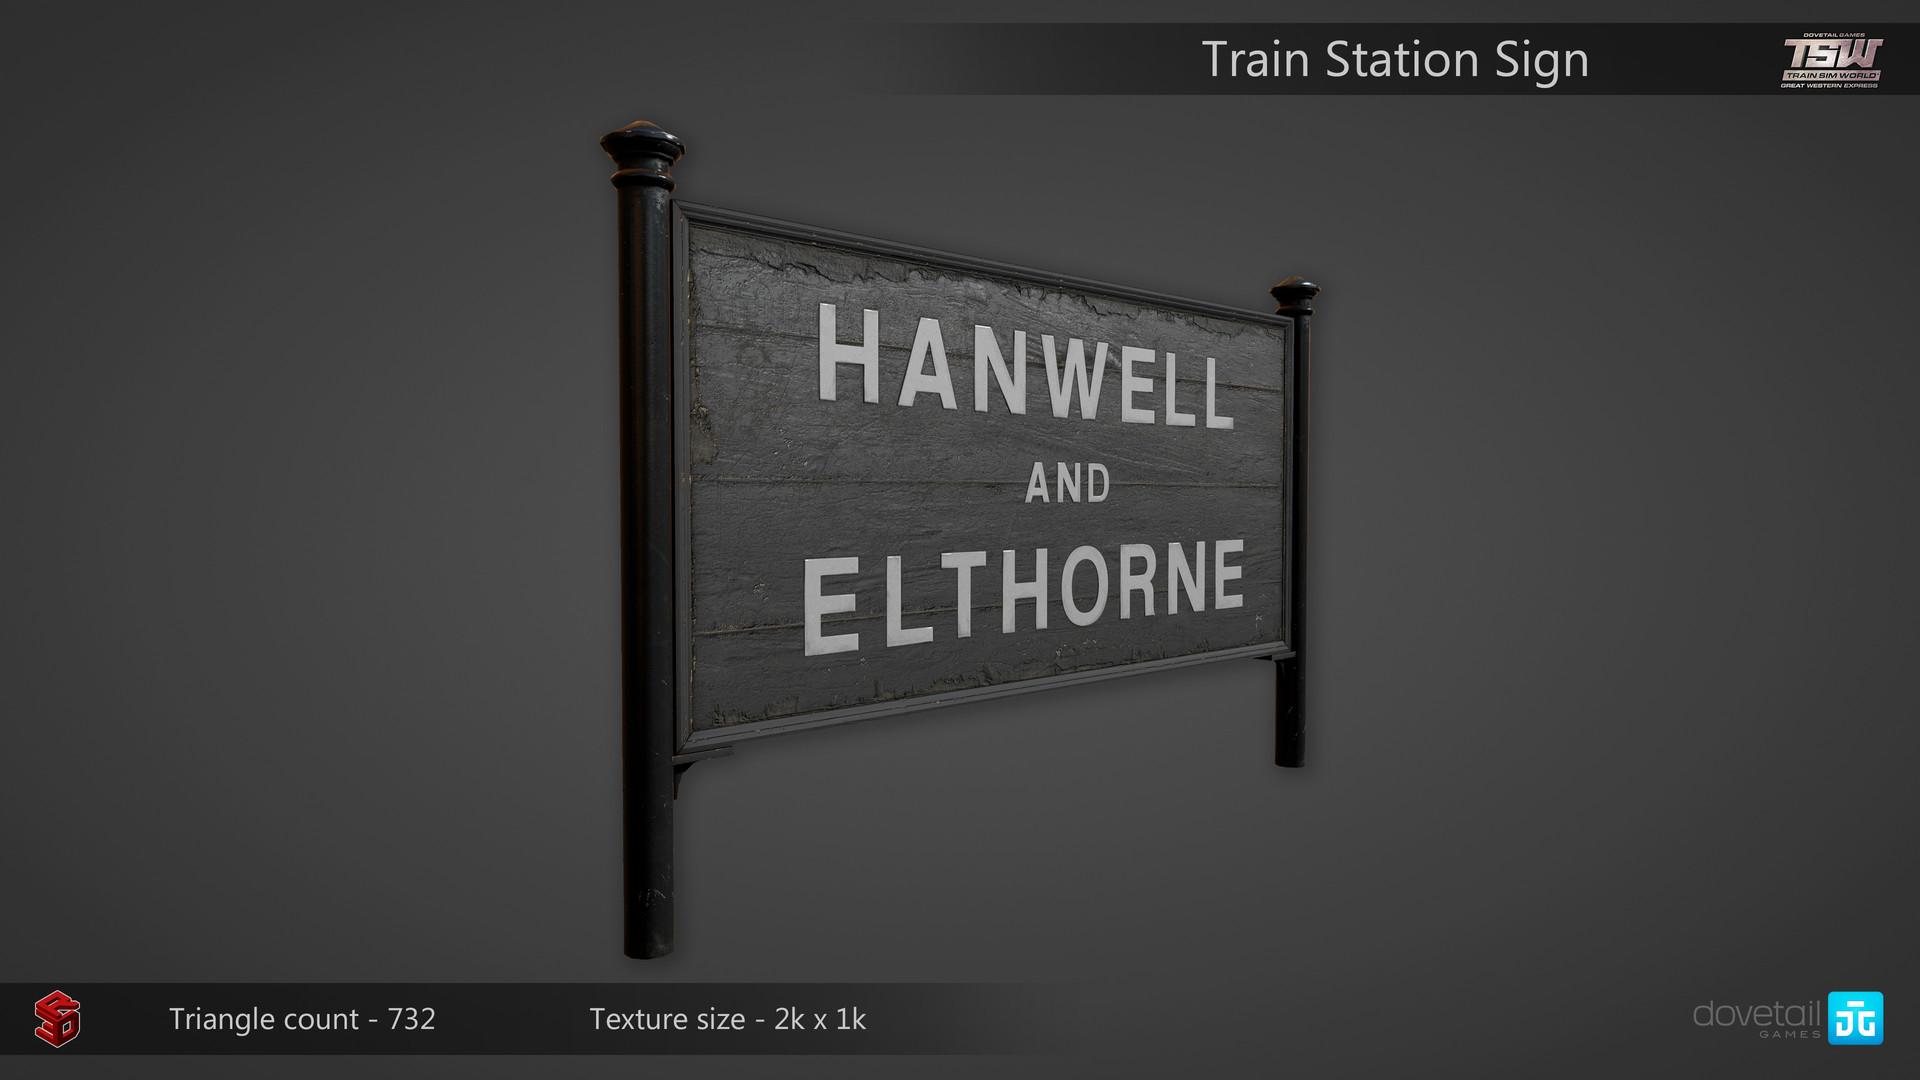 Ross mccafferty trainstationsign 01